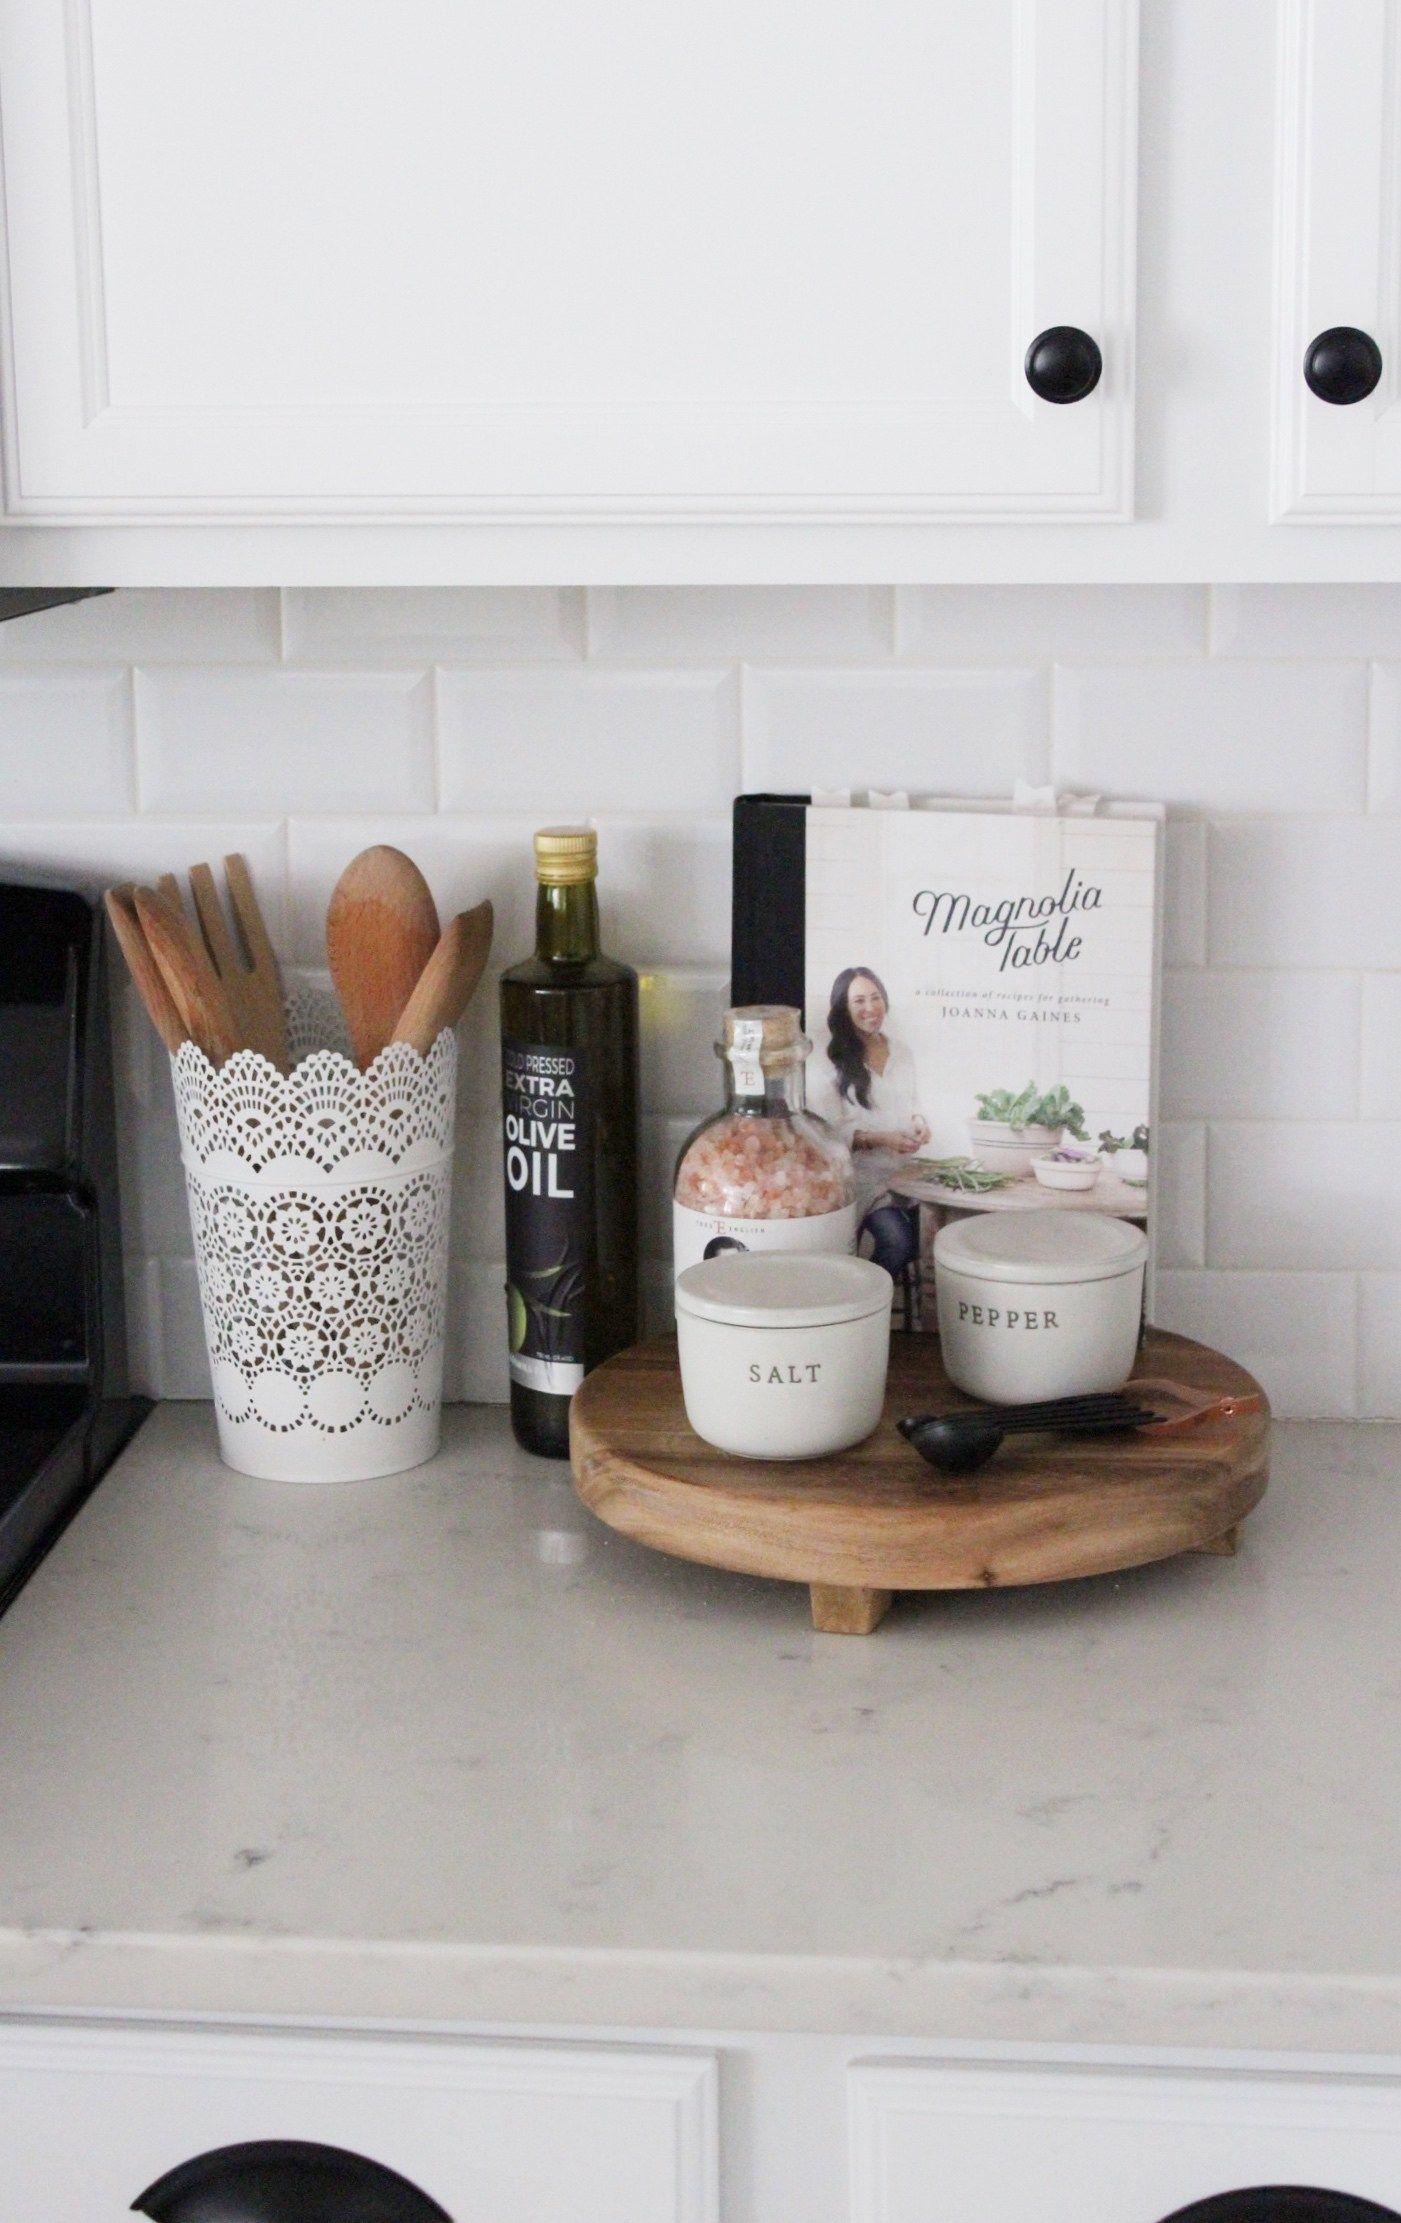 Magnolia Table Cookbook Magnolia Home Decor Target Home Decor Target Kitchen